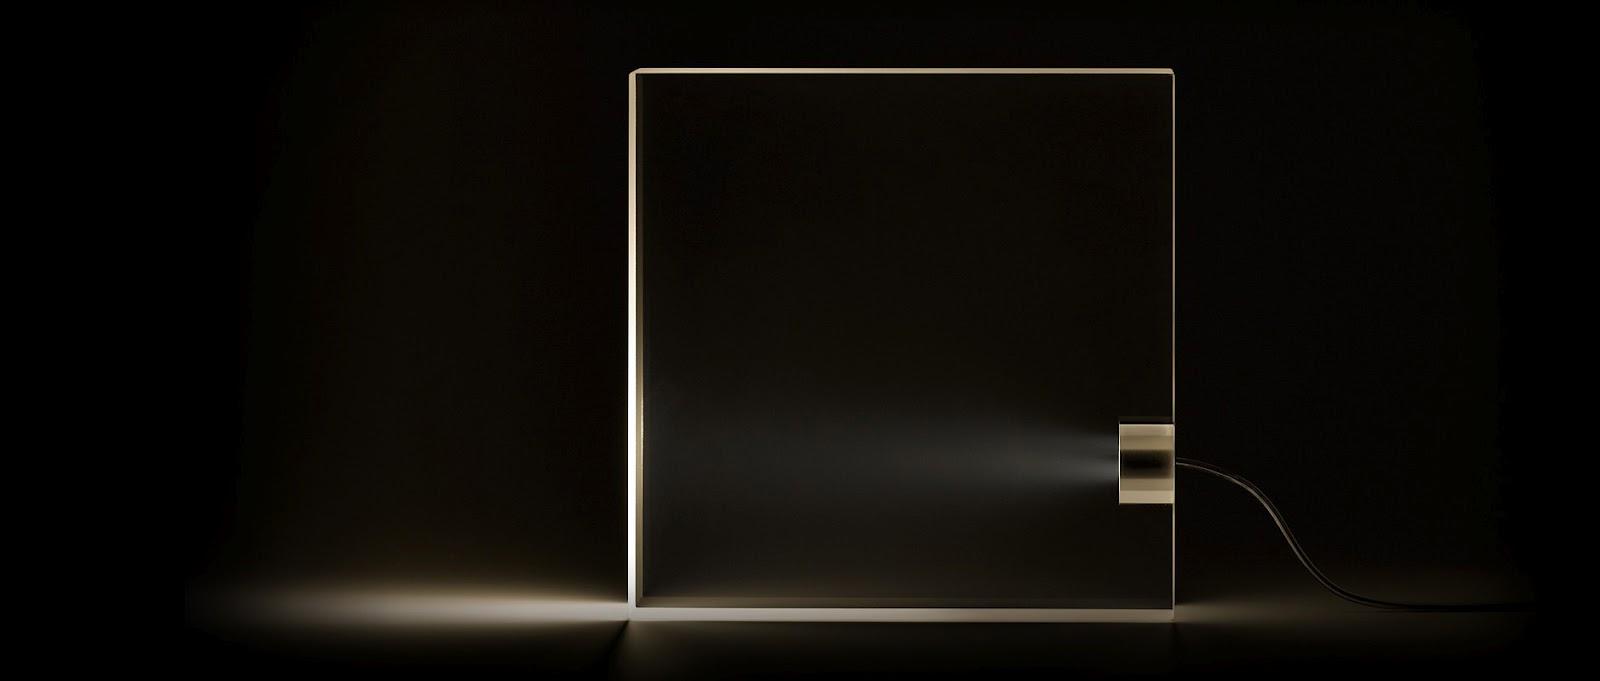 Tokujin yoshioka tofu lamp modern design by moderndesign tokujin yoshioka tofu lamp aloadofball Image collections